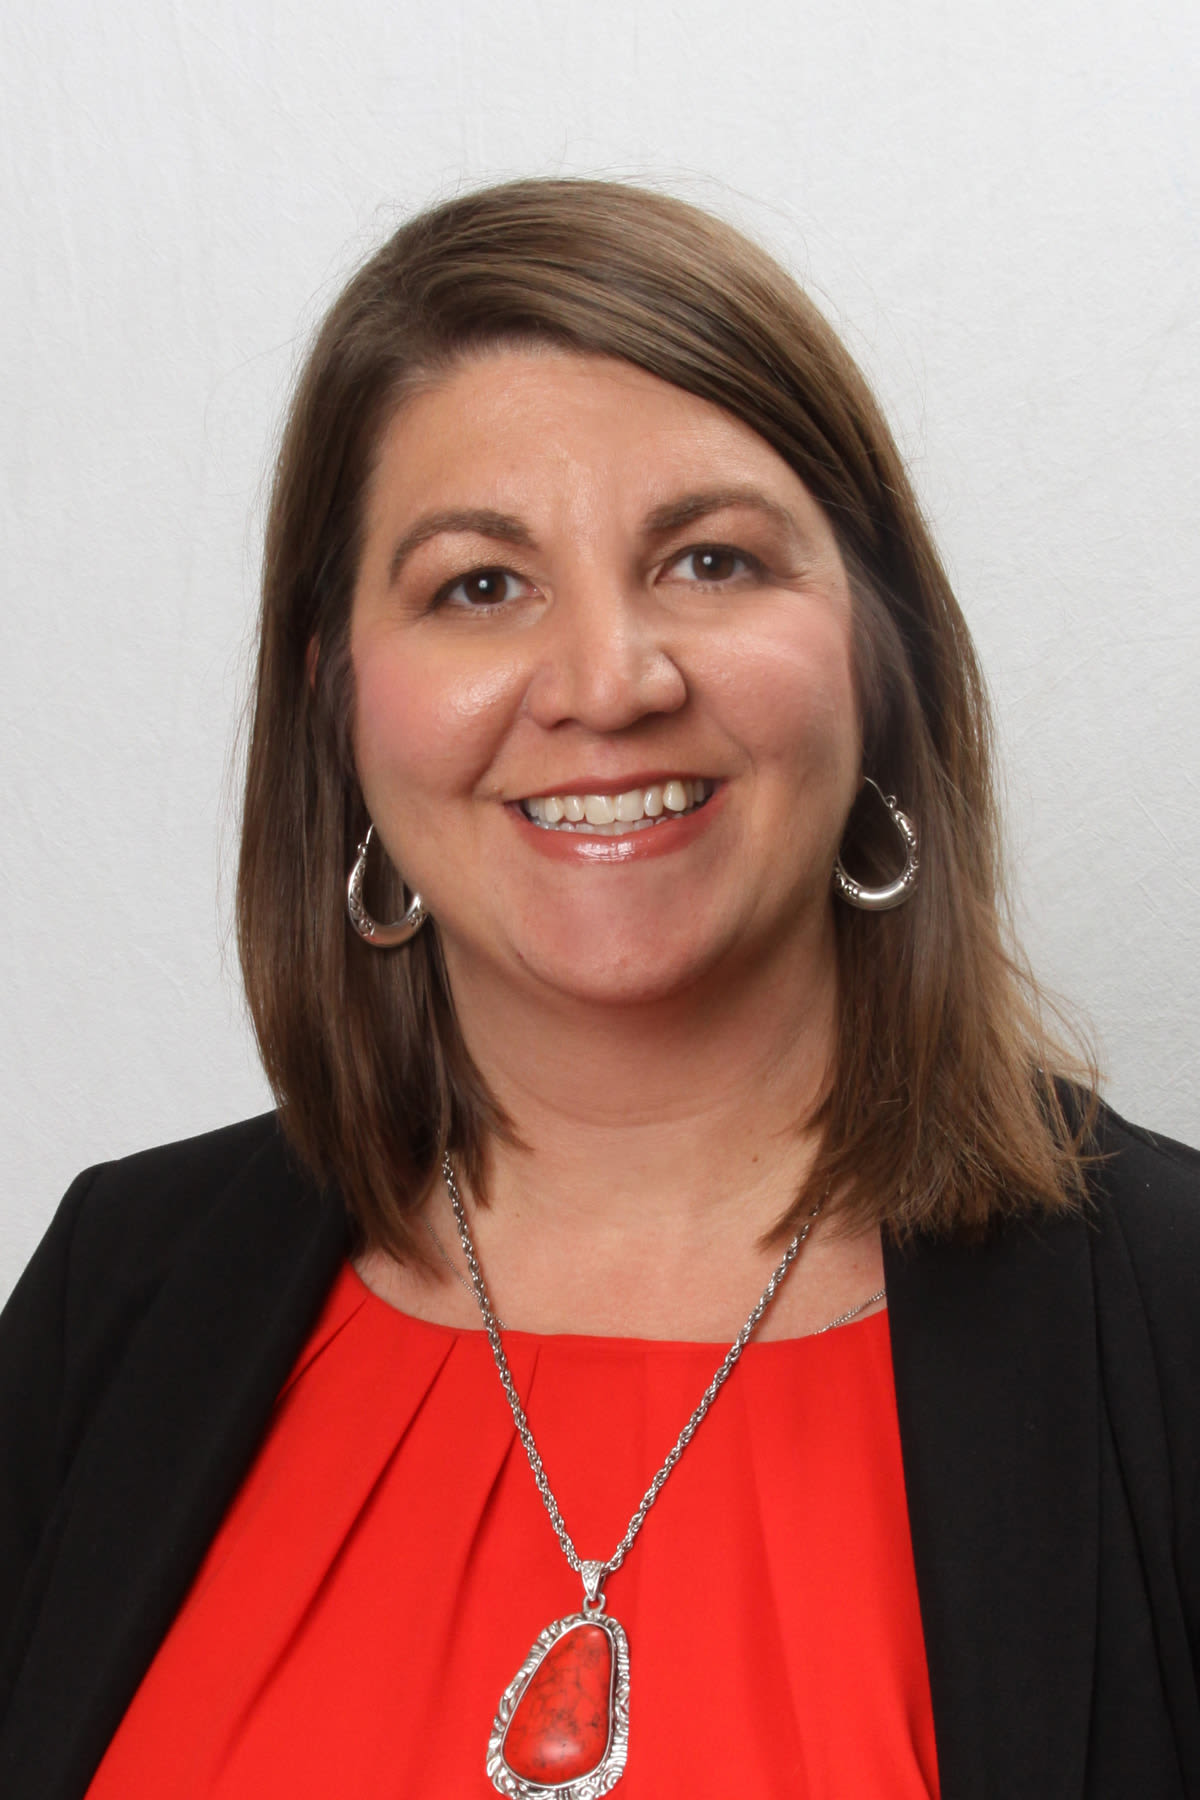 Shannon Schaab, Regional Manager